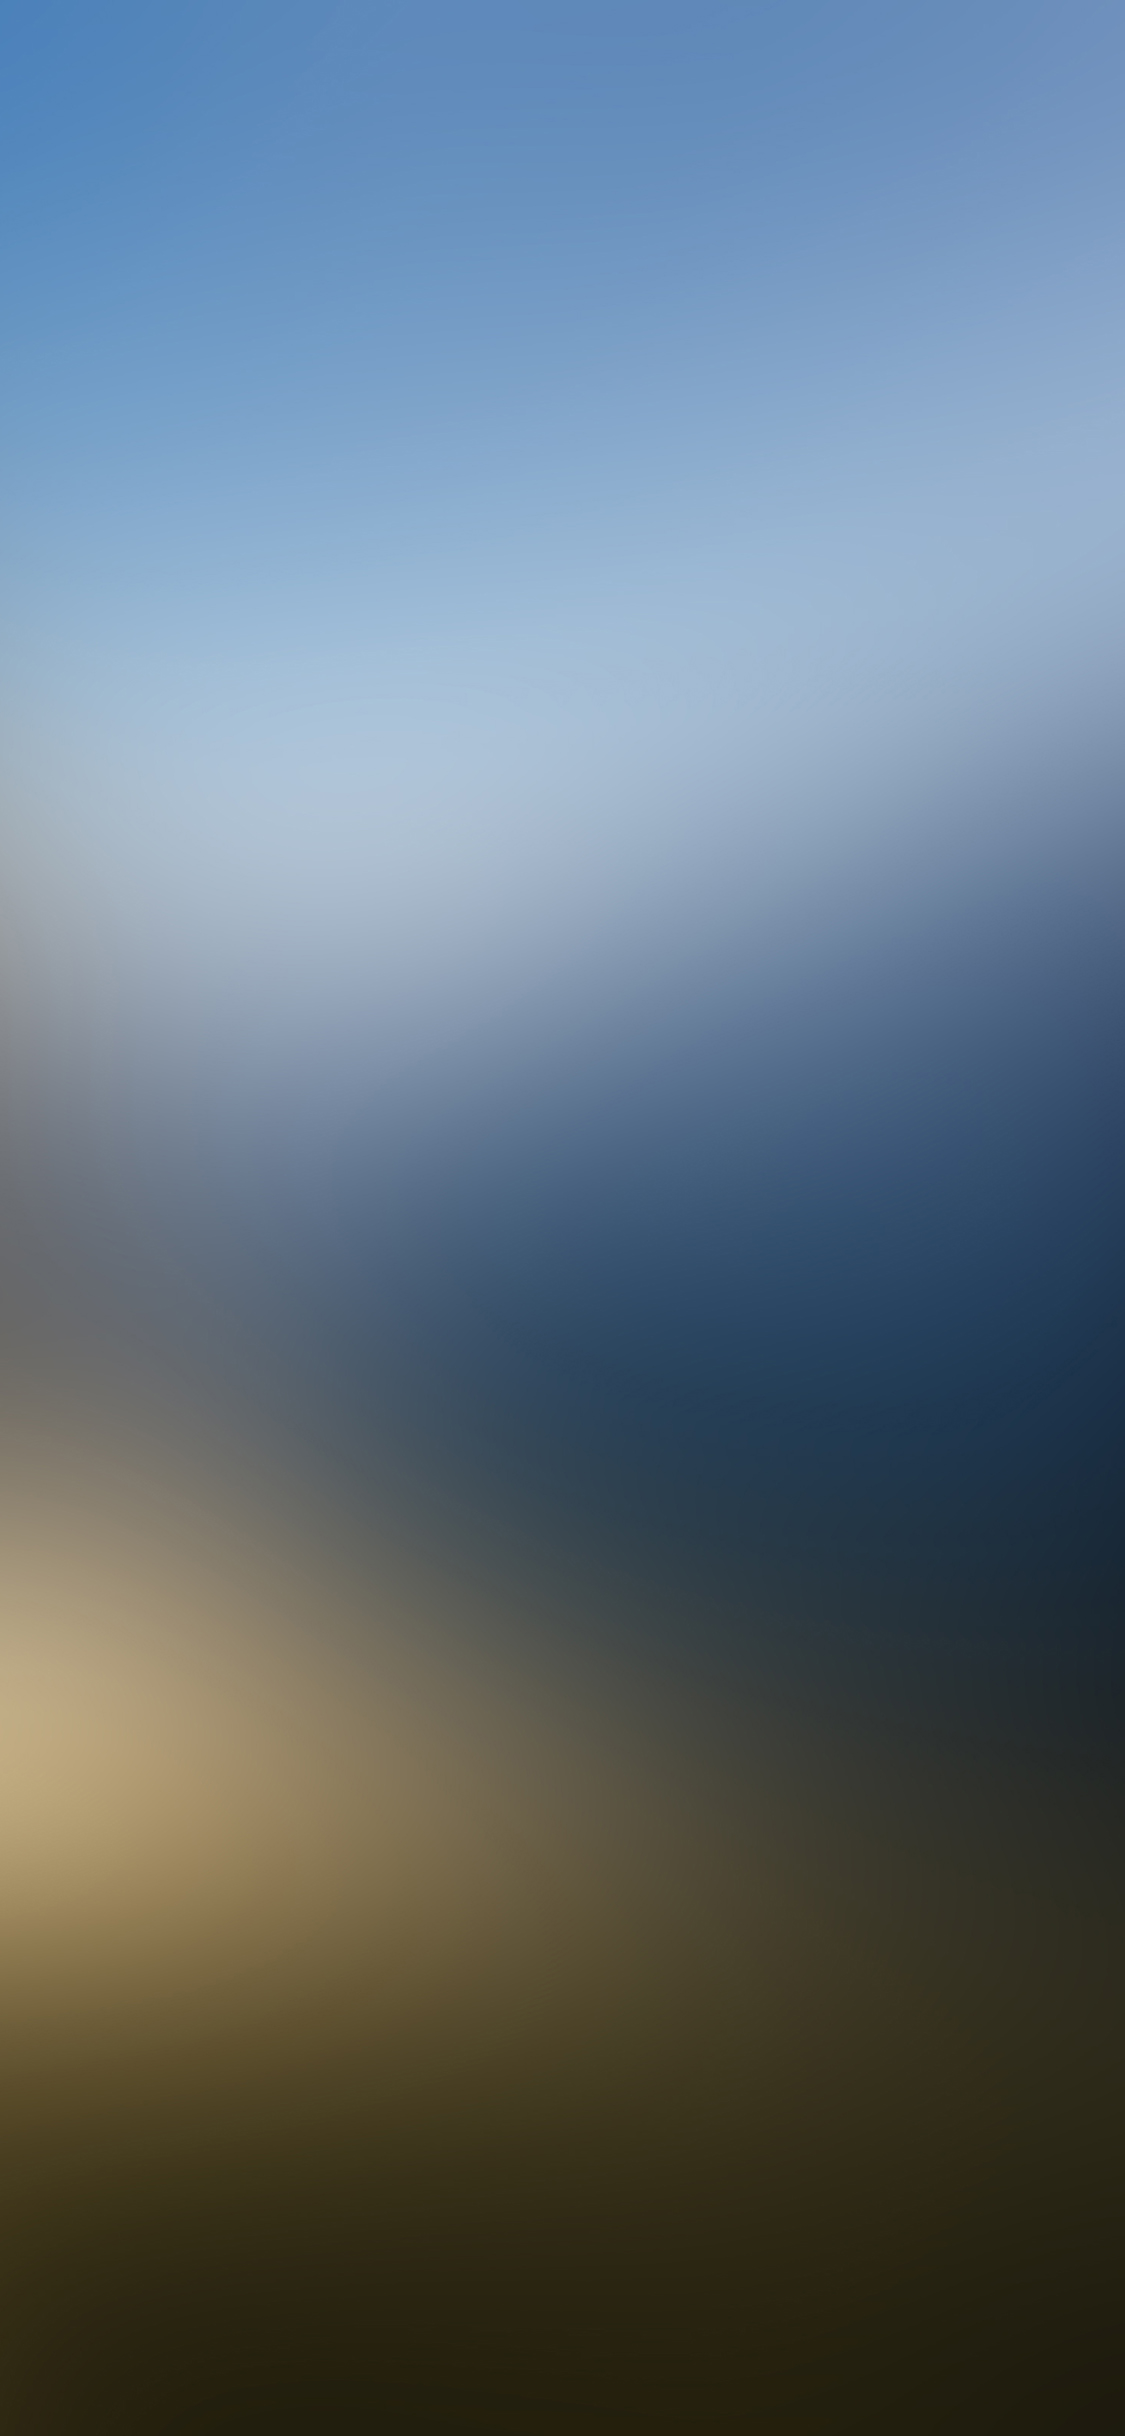 iPhoneXpapers.com-Apple-iPhone-wallpaper-sb66-wallpaper-yosemite-blur